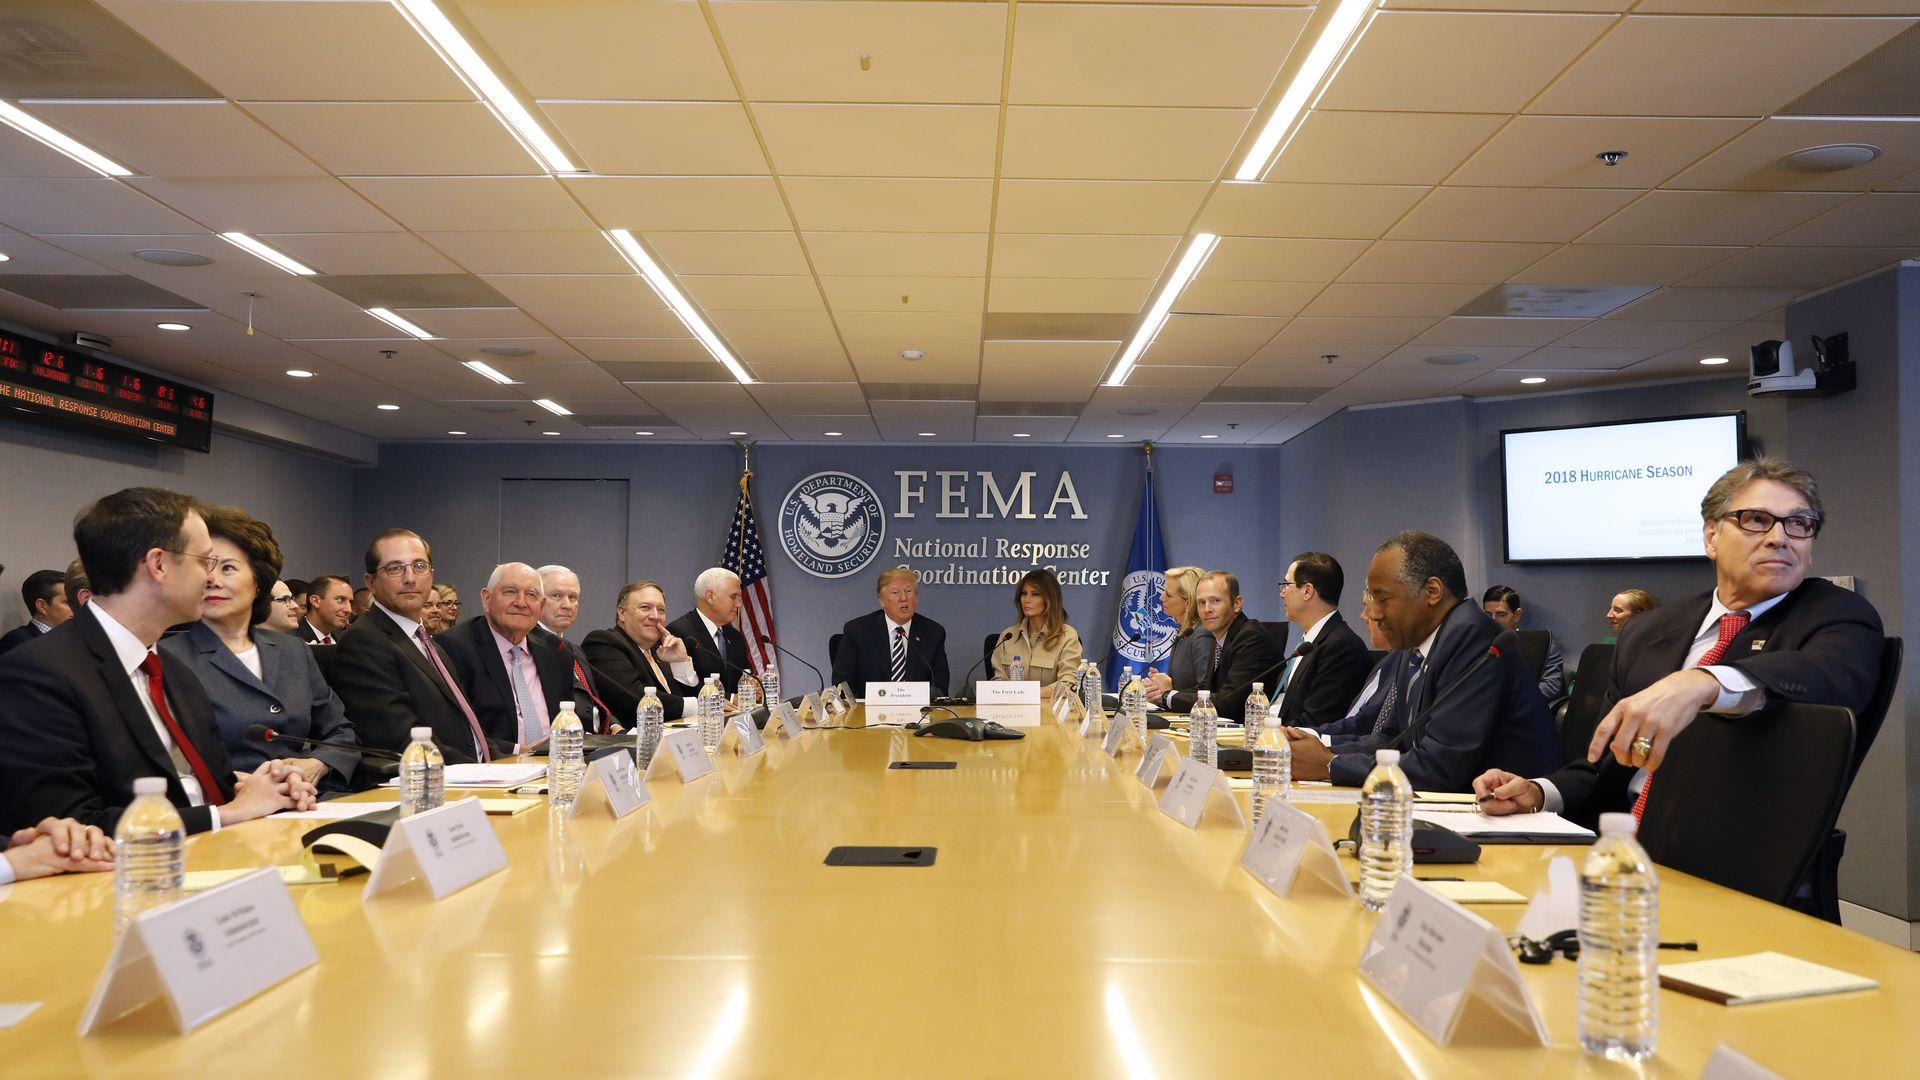 FEMA data breach leaks personal, banking details of 2.5 million disaster survivors